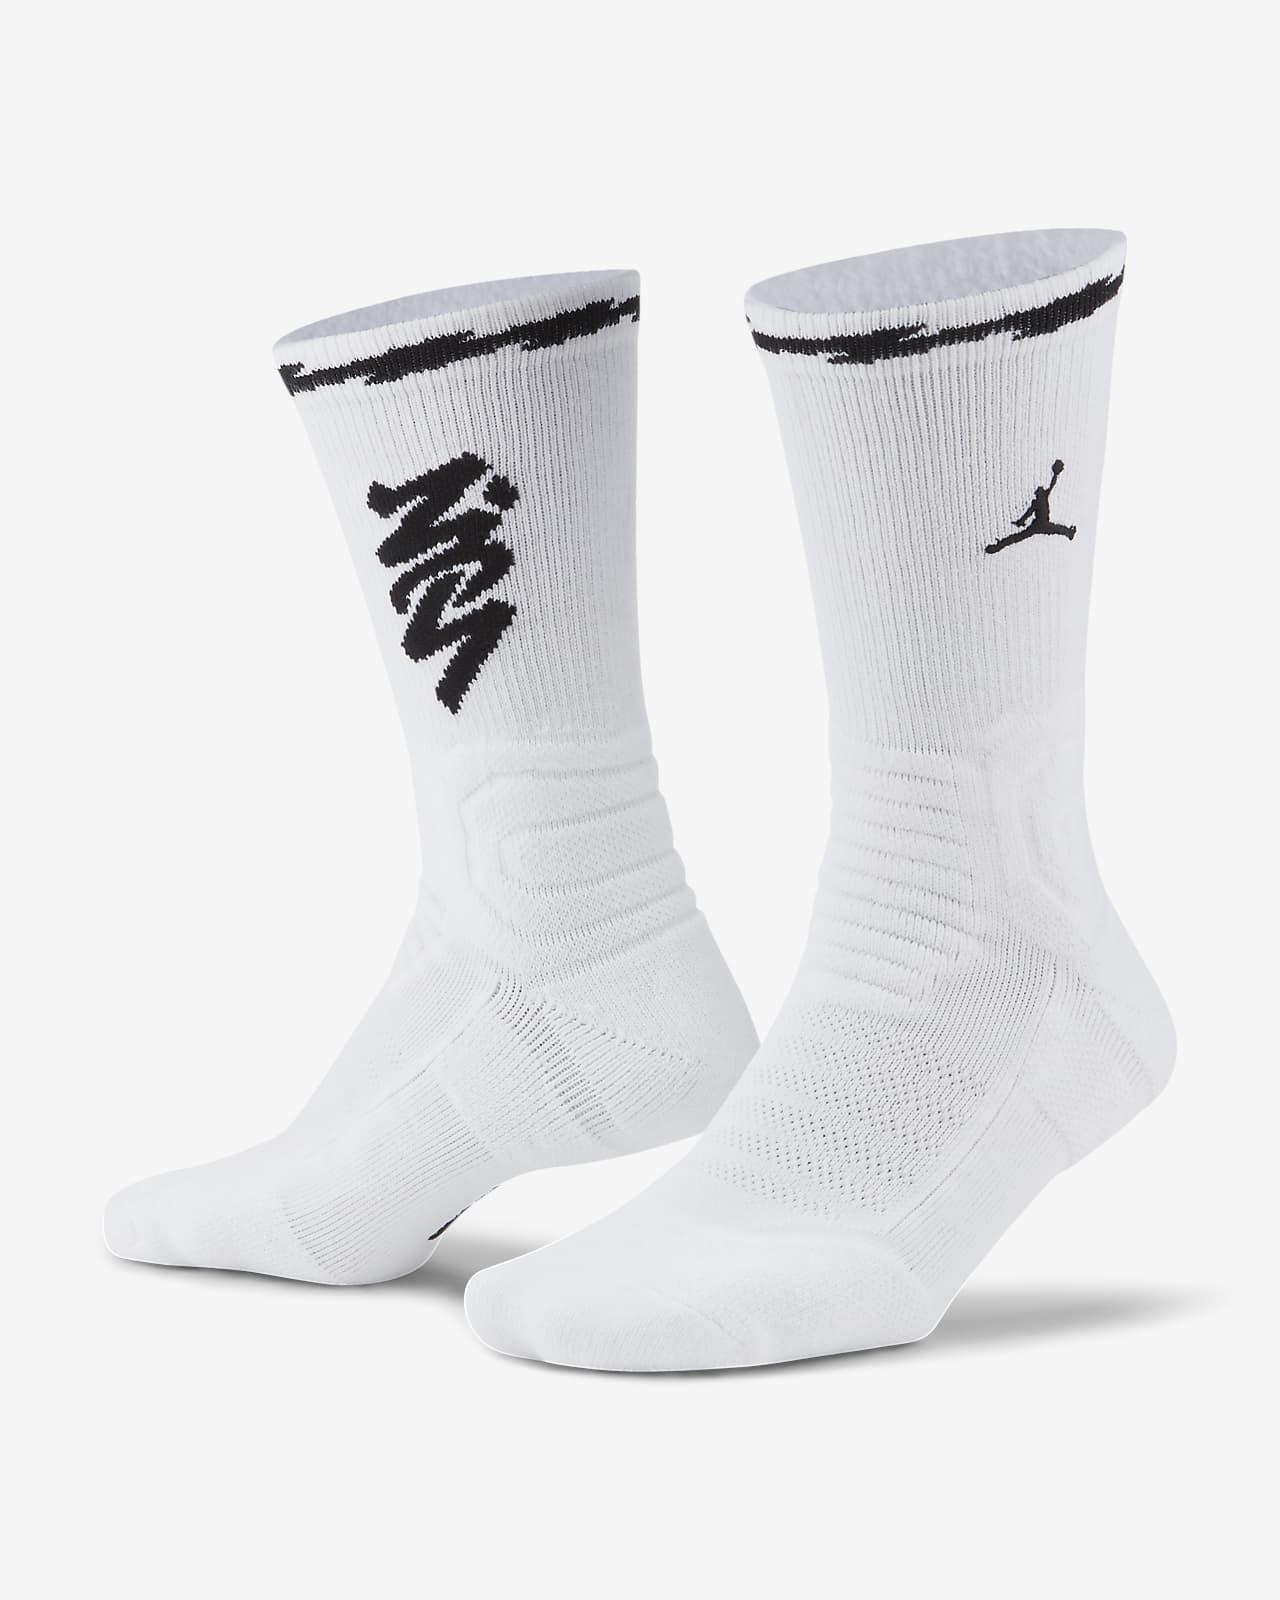 Calcetines deportivos Zion Flight